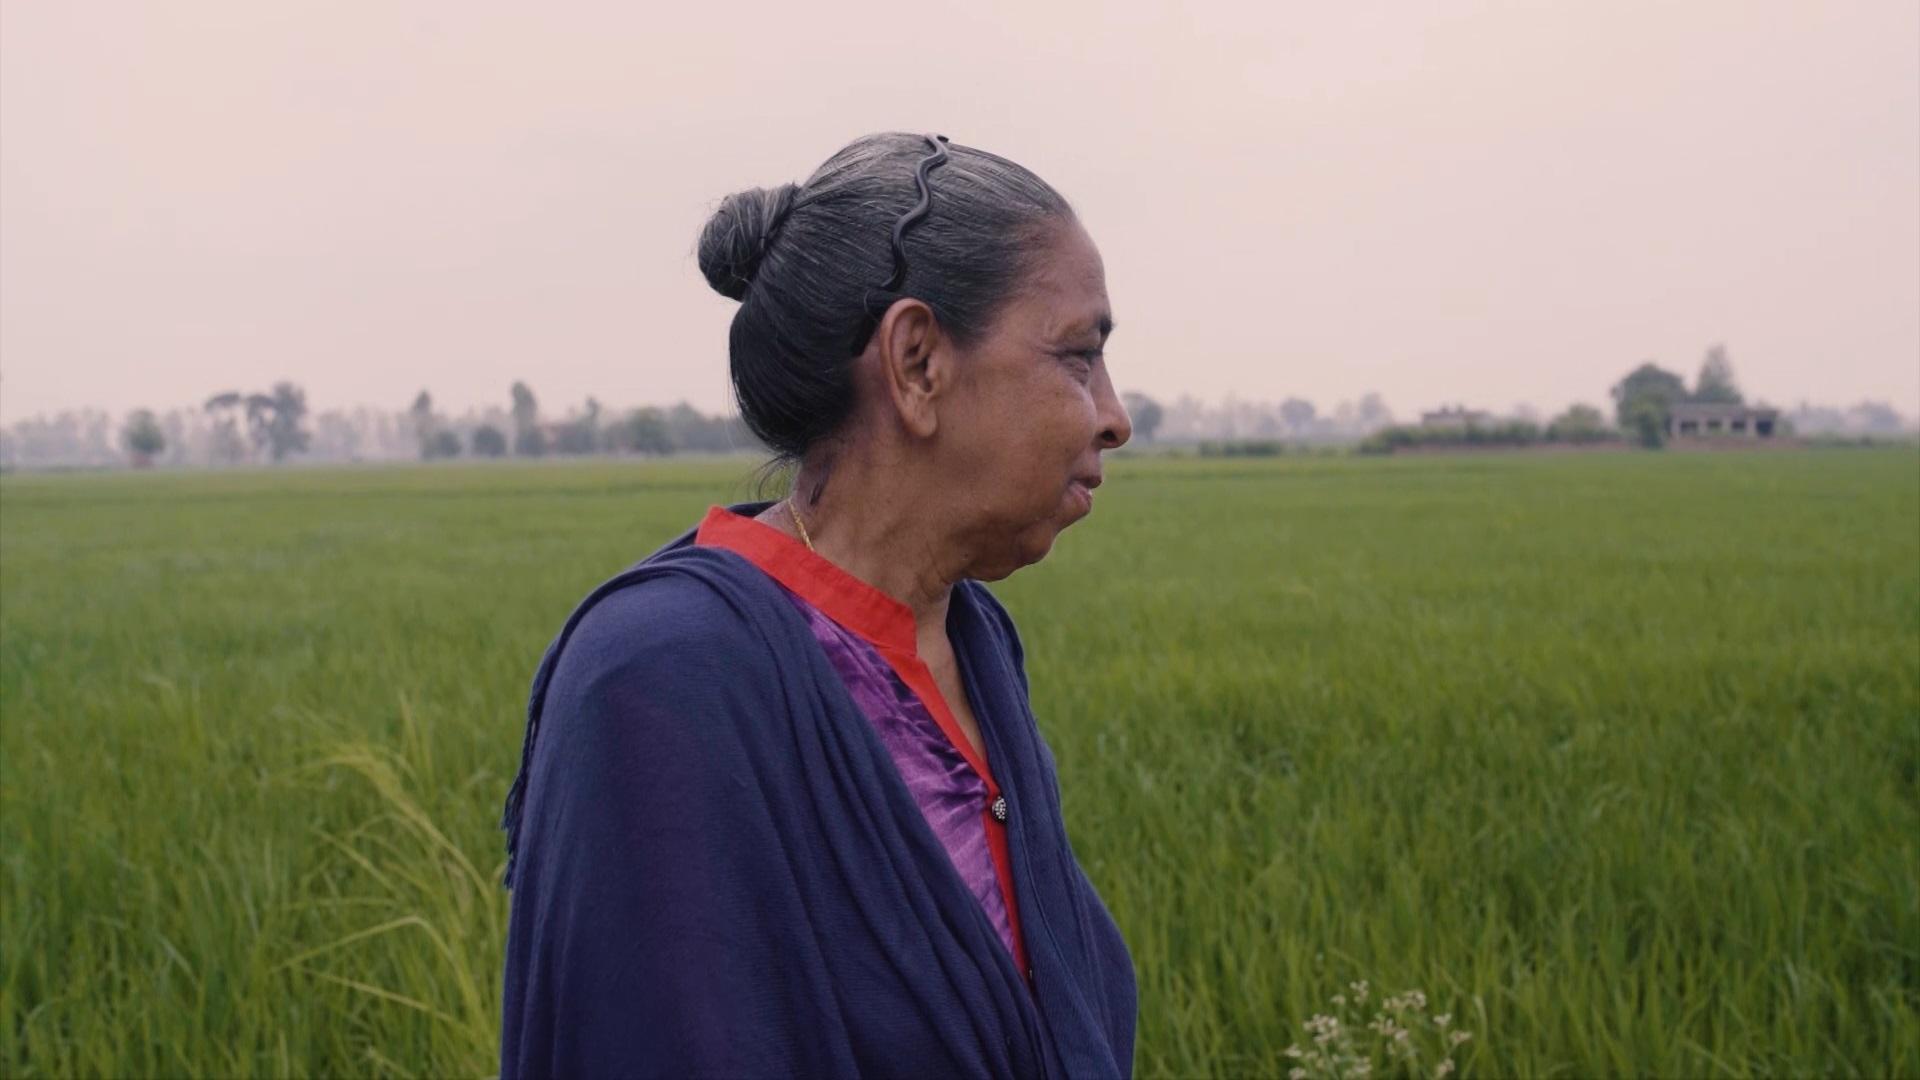 GurJeevaan Singh BalRose Profile Image